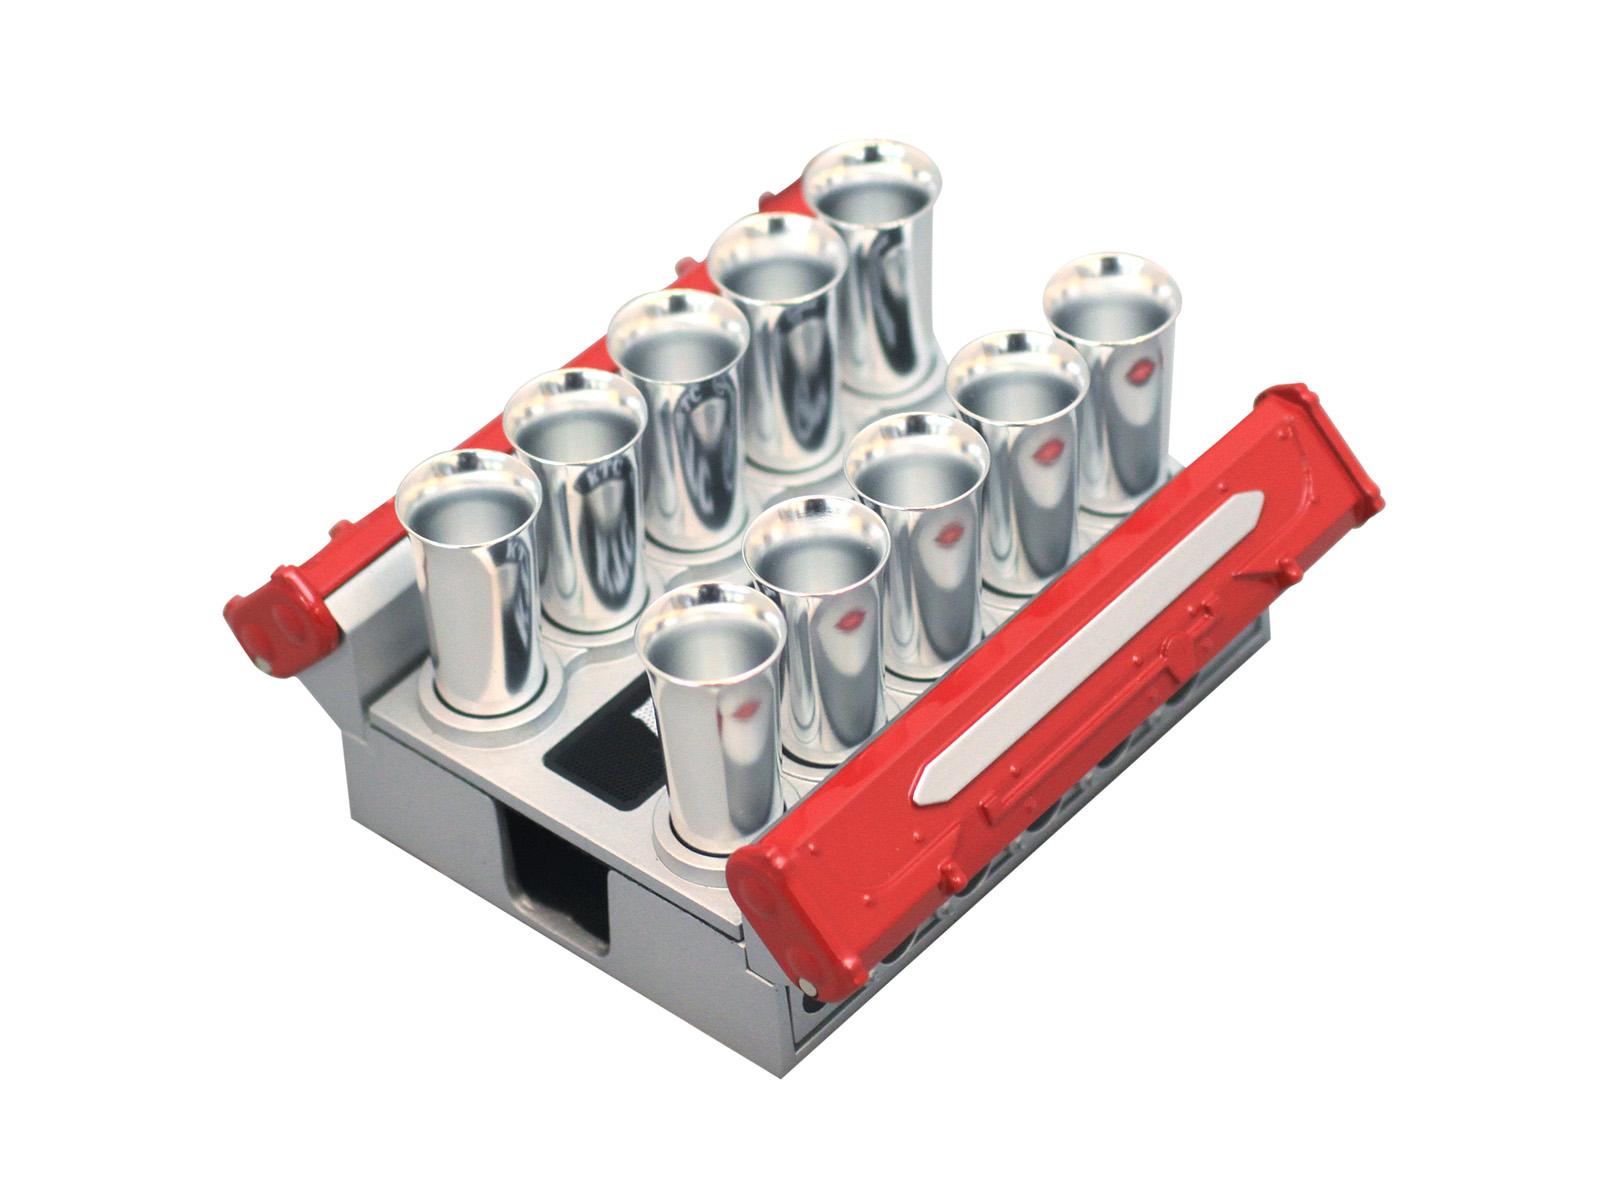 V10エンジンカードホルダー(GAZYG-009)